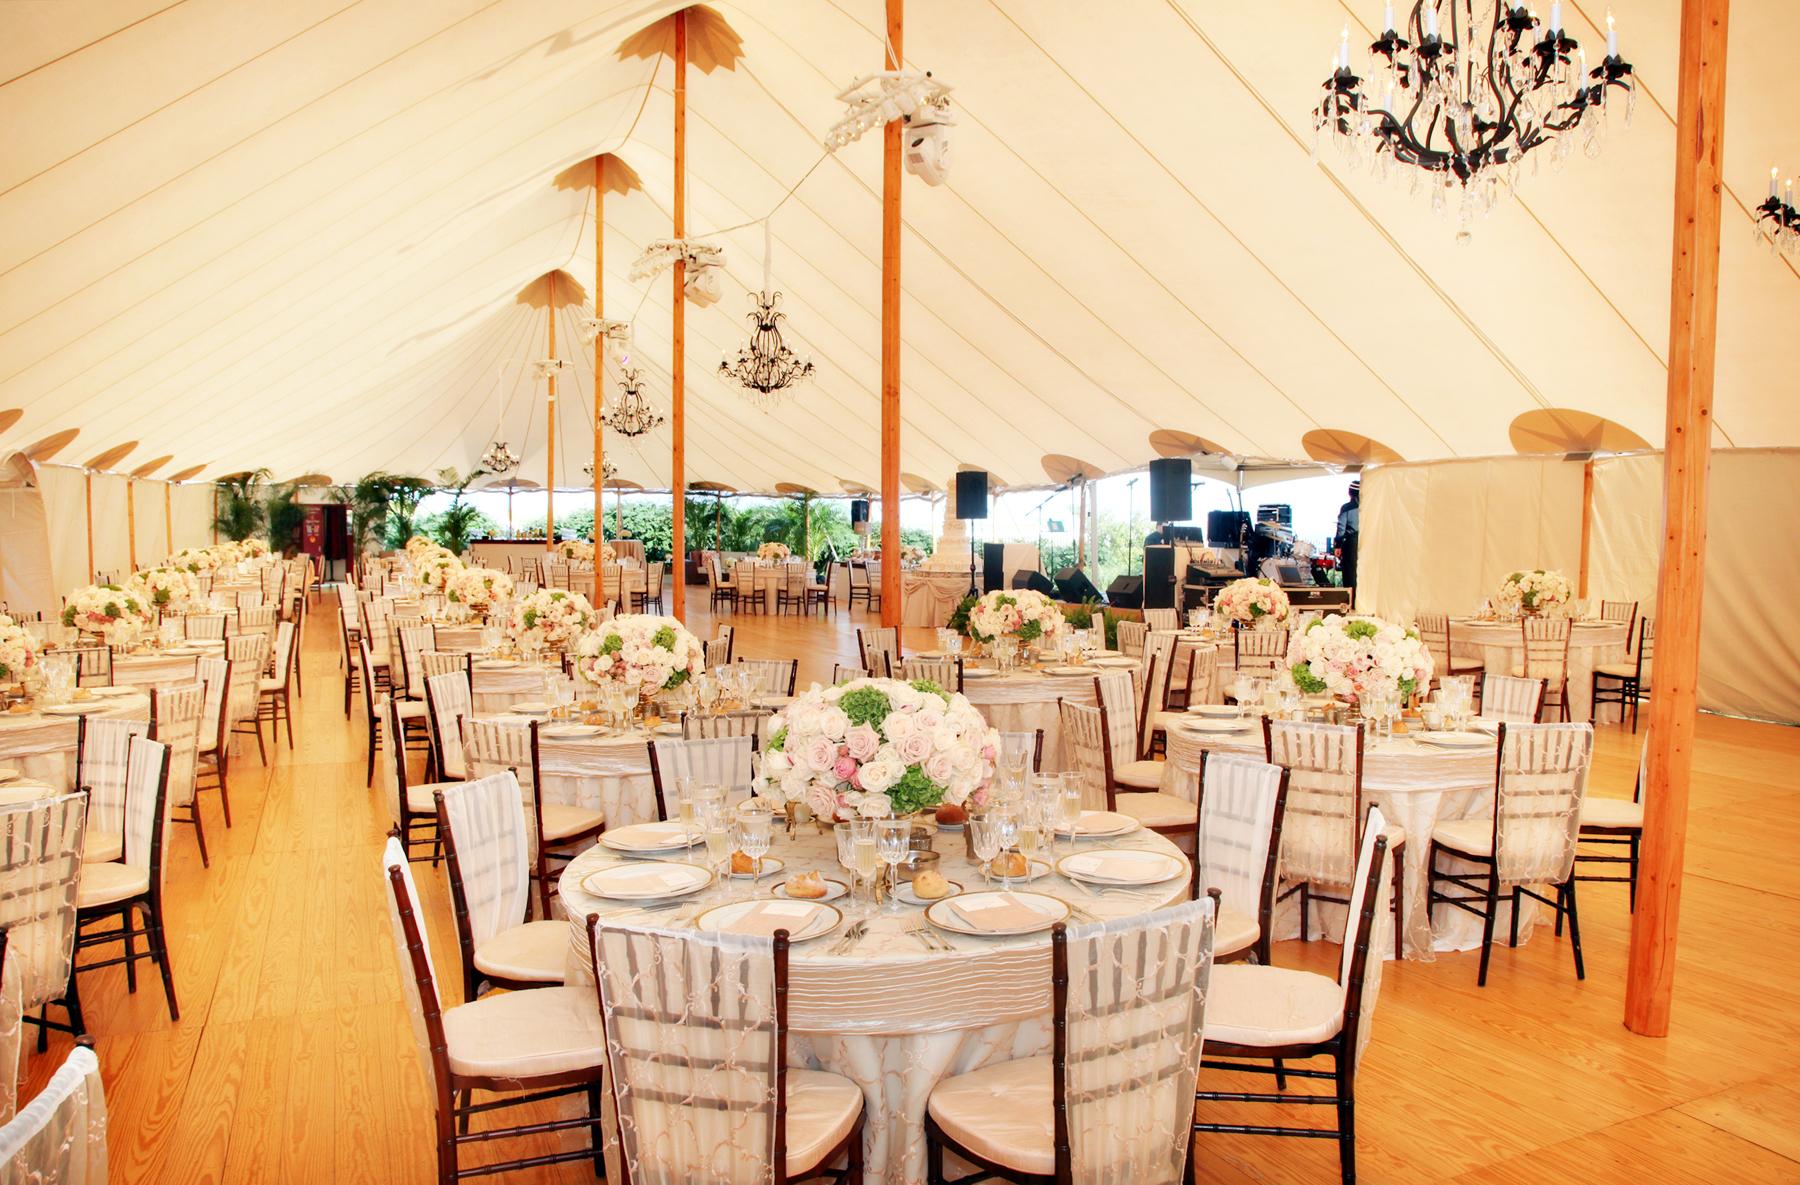 Chatham Bars Inn Weddings 1073